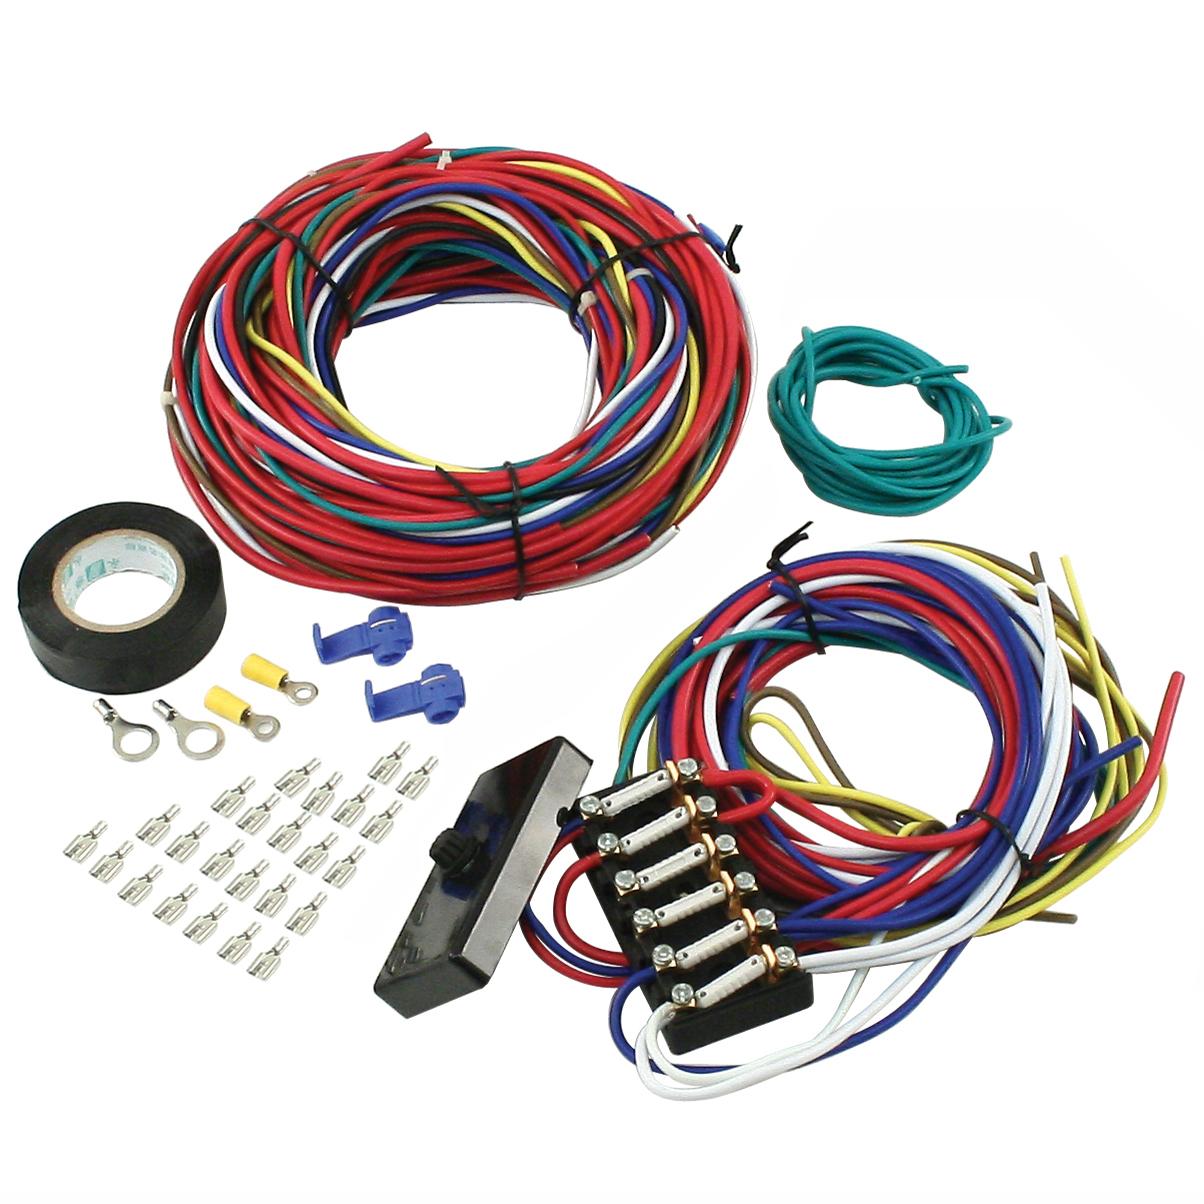 empi 9466 vw dune buggy sand rail baja universal wiring harness with rh ebay com